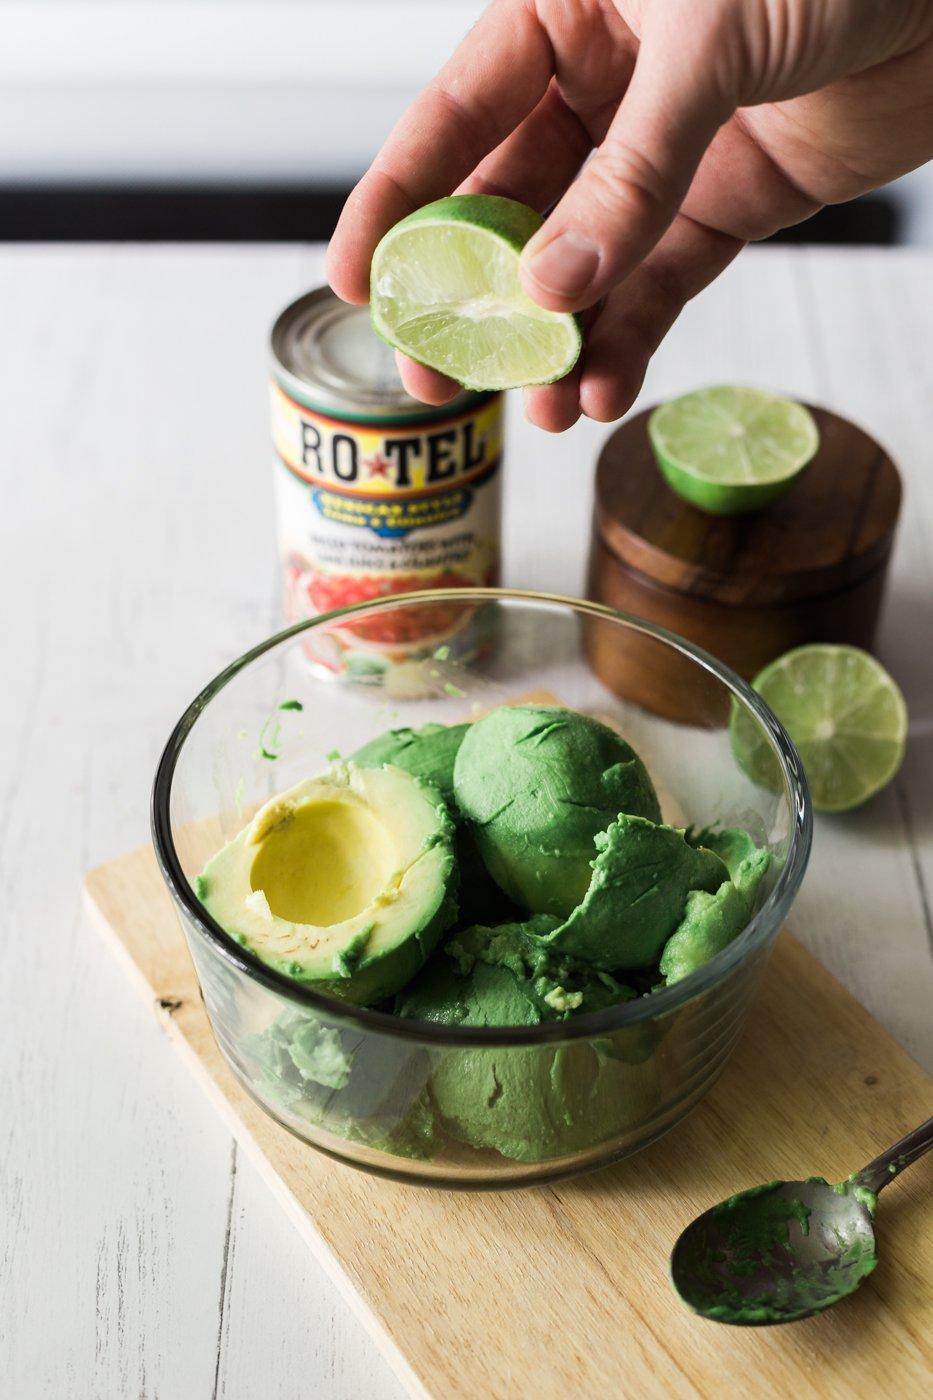 spicy guacamole recipe, guacamole recipe, lifestyle blog, memorial day party tips, recipes with RO*TEL